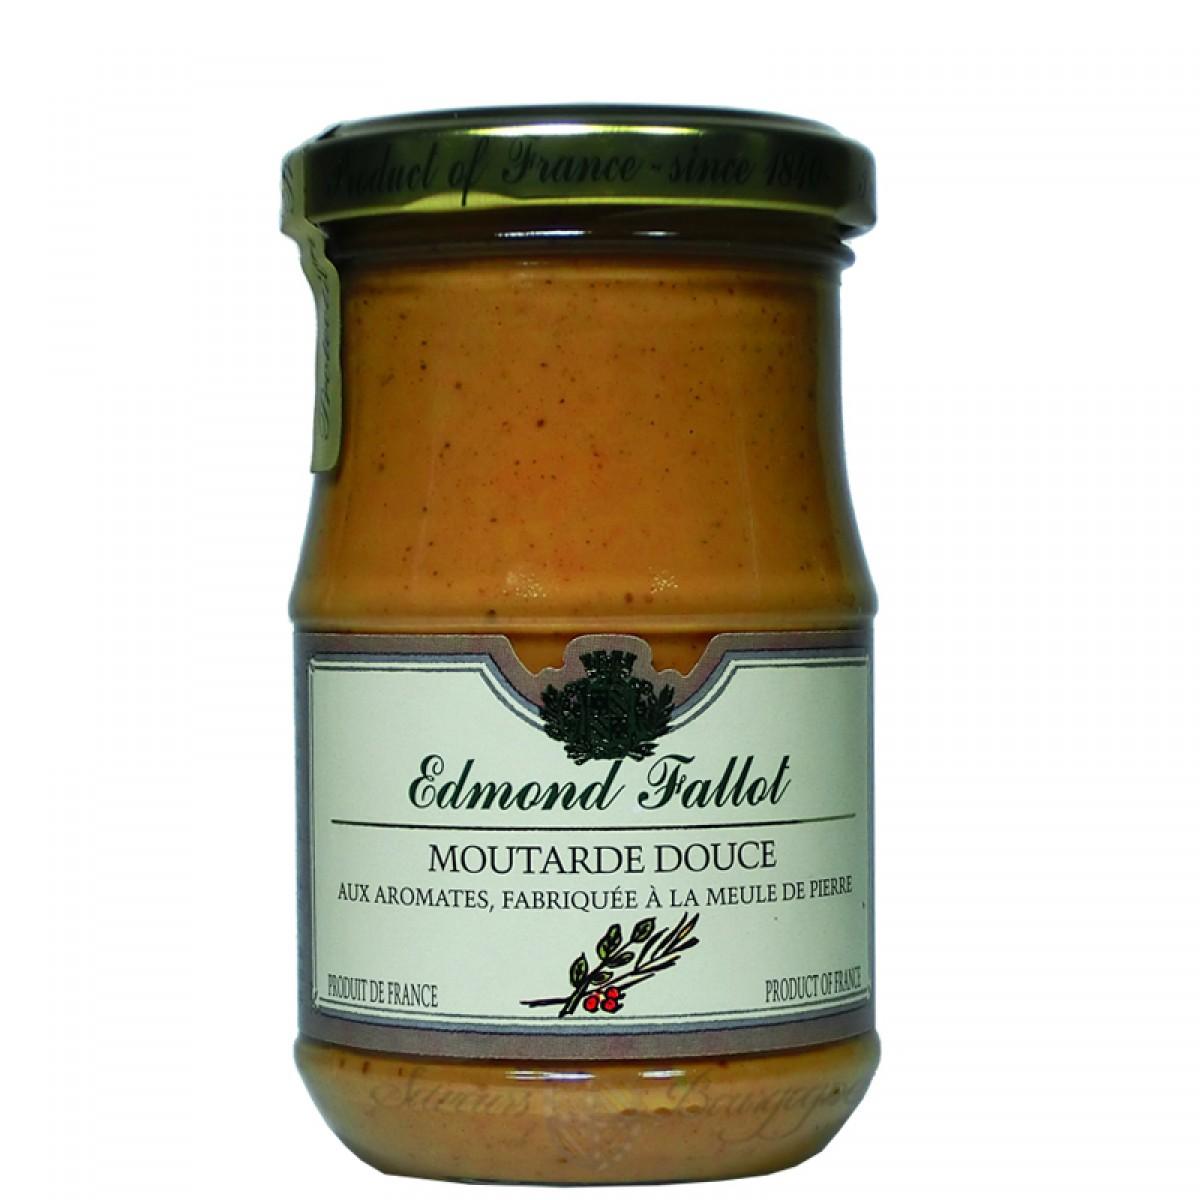 Moutarde brune douce aux aromates 210g fallot saveurs de bourgogne vente - Moutarde fallot vente ...